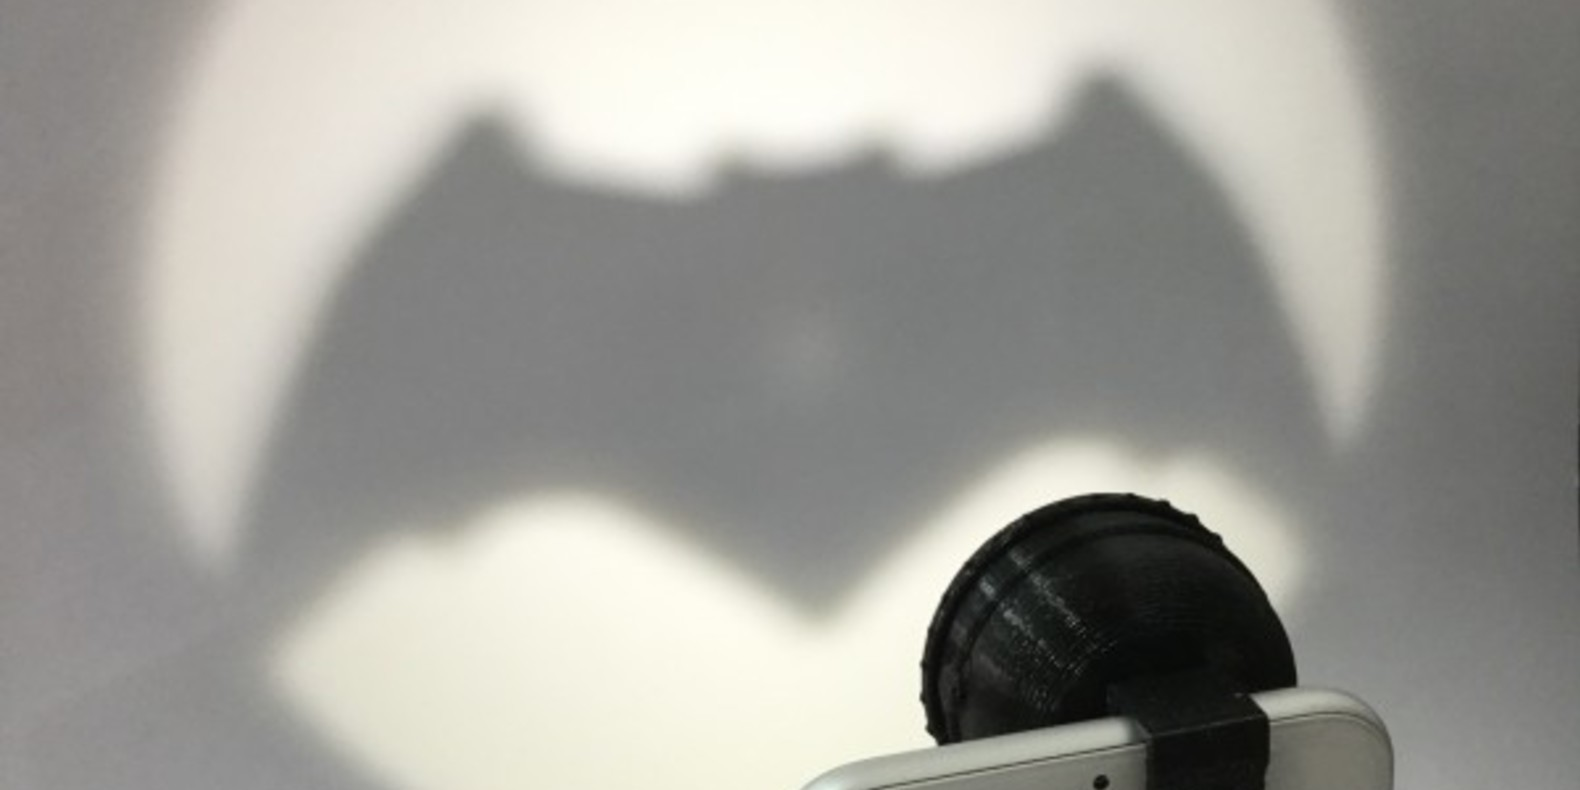 Bat-signal-fichier-3D-stl-cults-3DNG-iphone-2.jpg